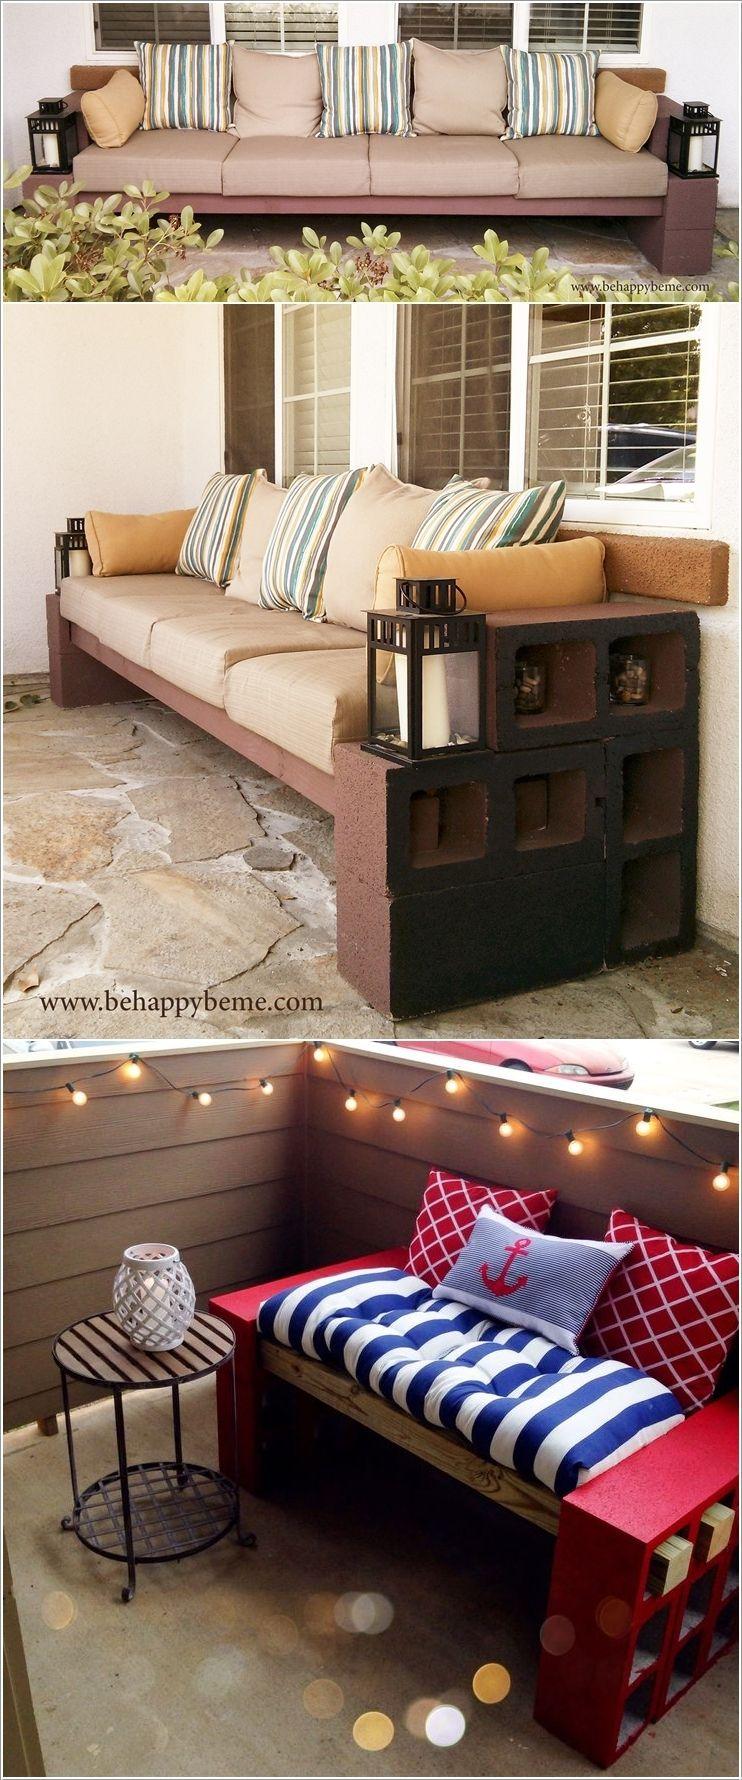 Diy cinder block bench idea decoração pinterest cinder block